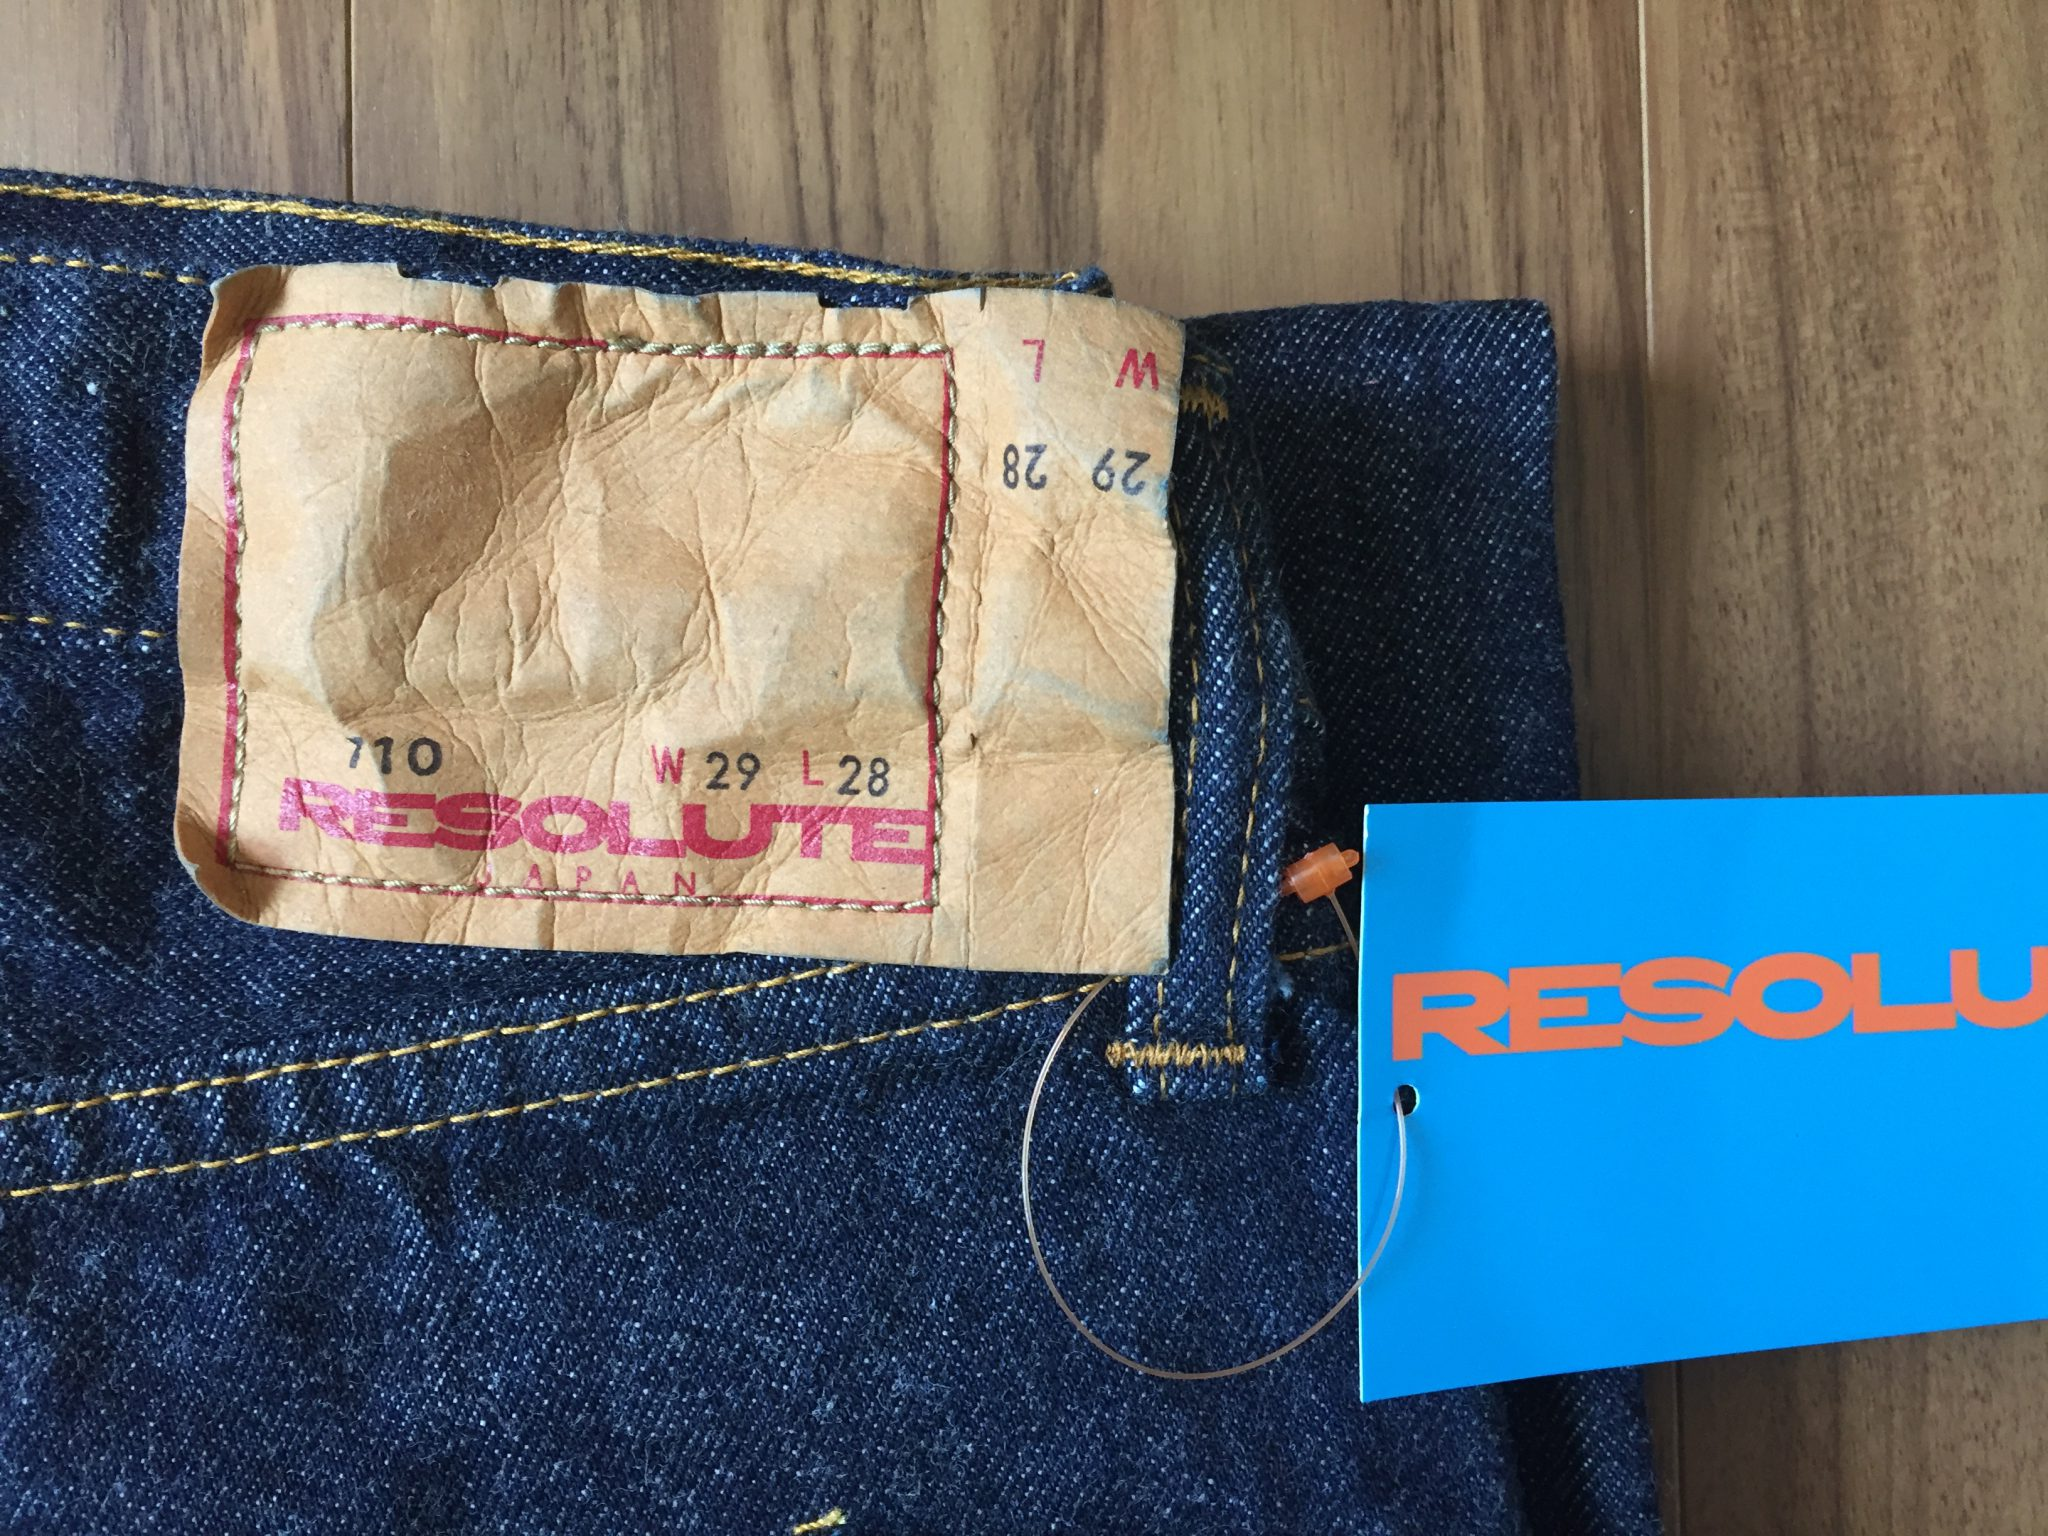 Resolute(リゾルト)710 購入直後の表情 革パッチ